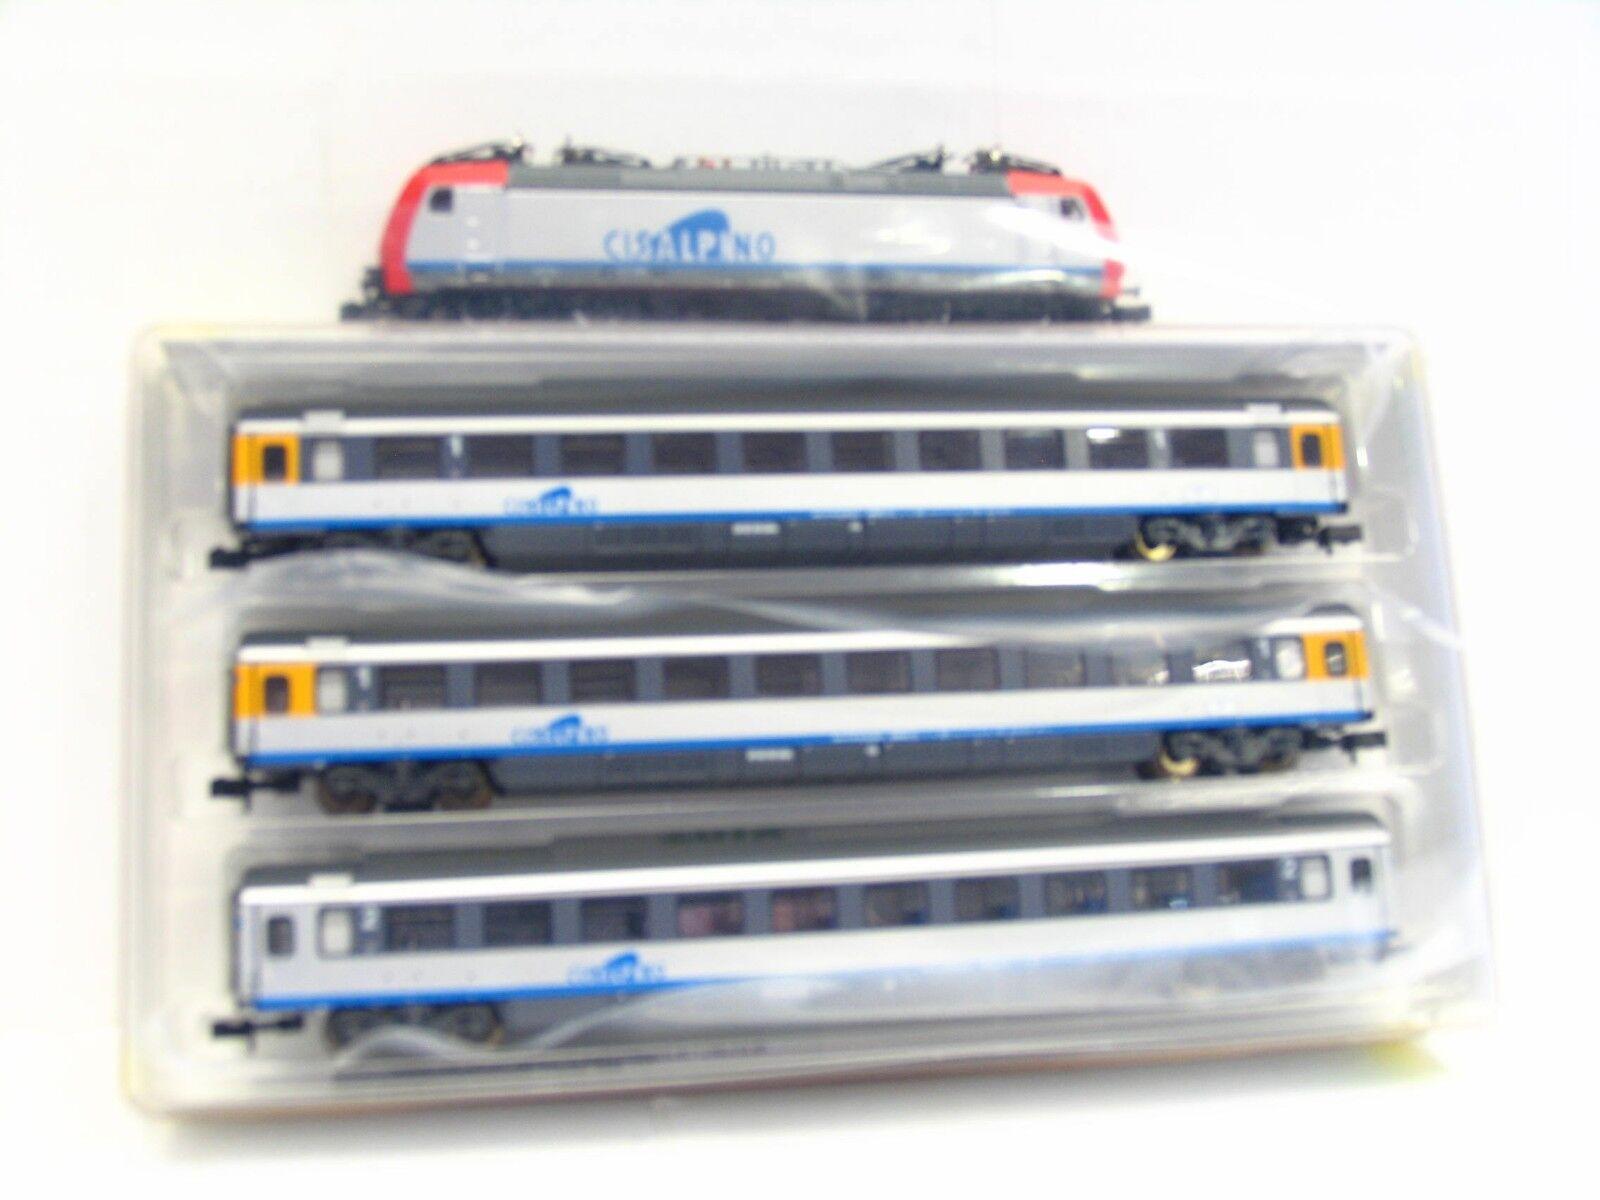 Minitrix n 11629 tren-set ferroviariospara m. re 484 SBB digital SX embalaje original (v6121)